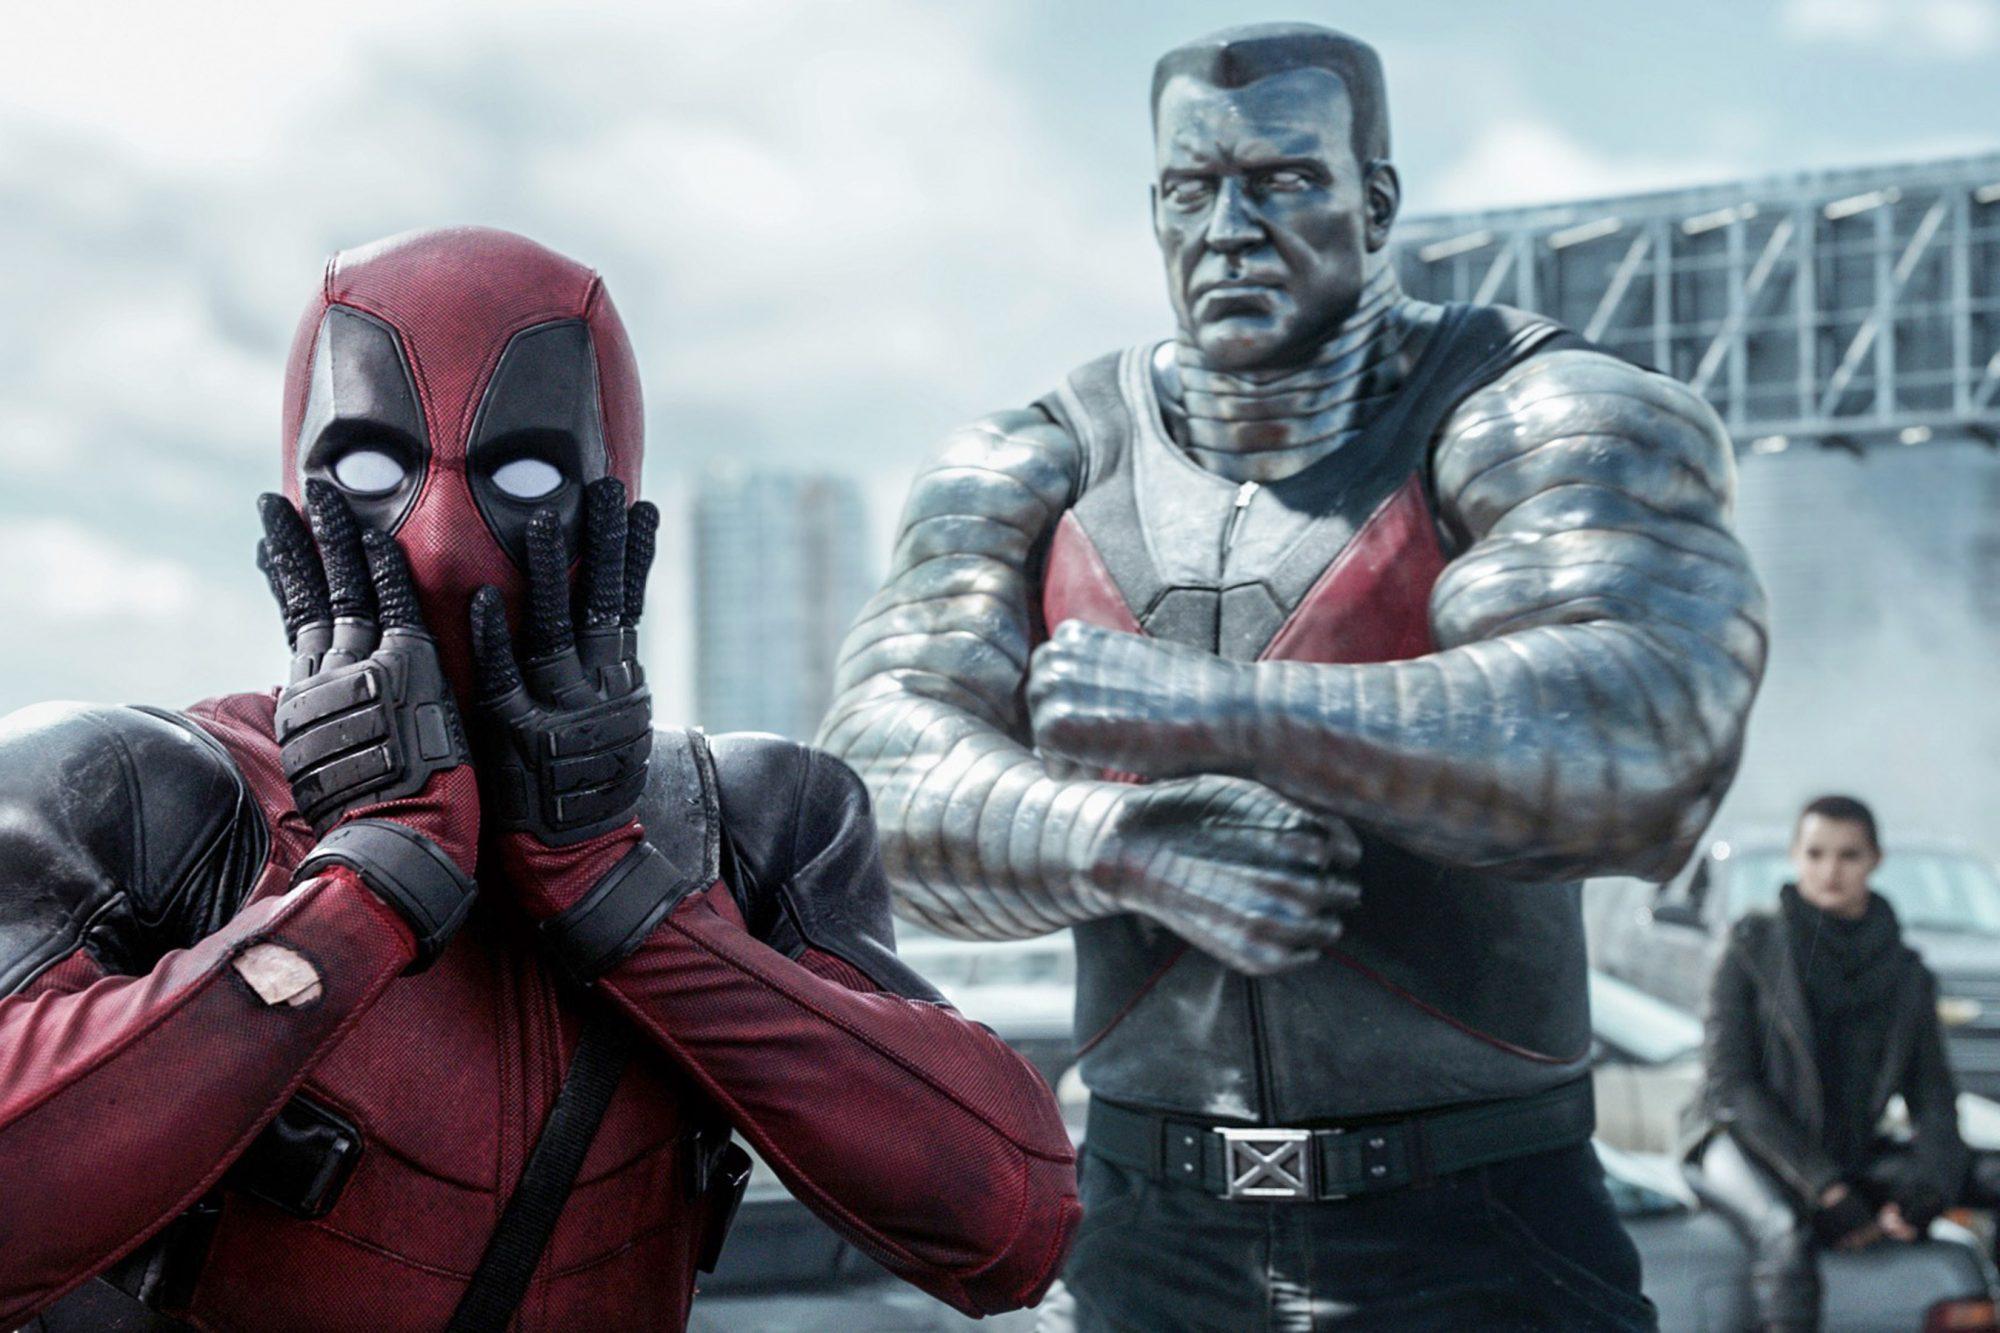 DEADPOOL, from left: Ryan Reynolds, as Deadpool, Colossus (voice: Stefan Kapicic), Brianna